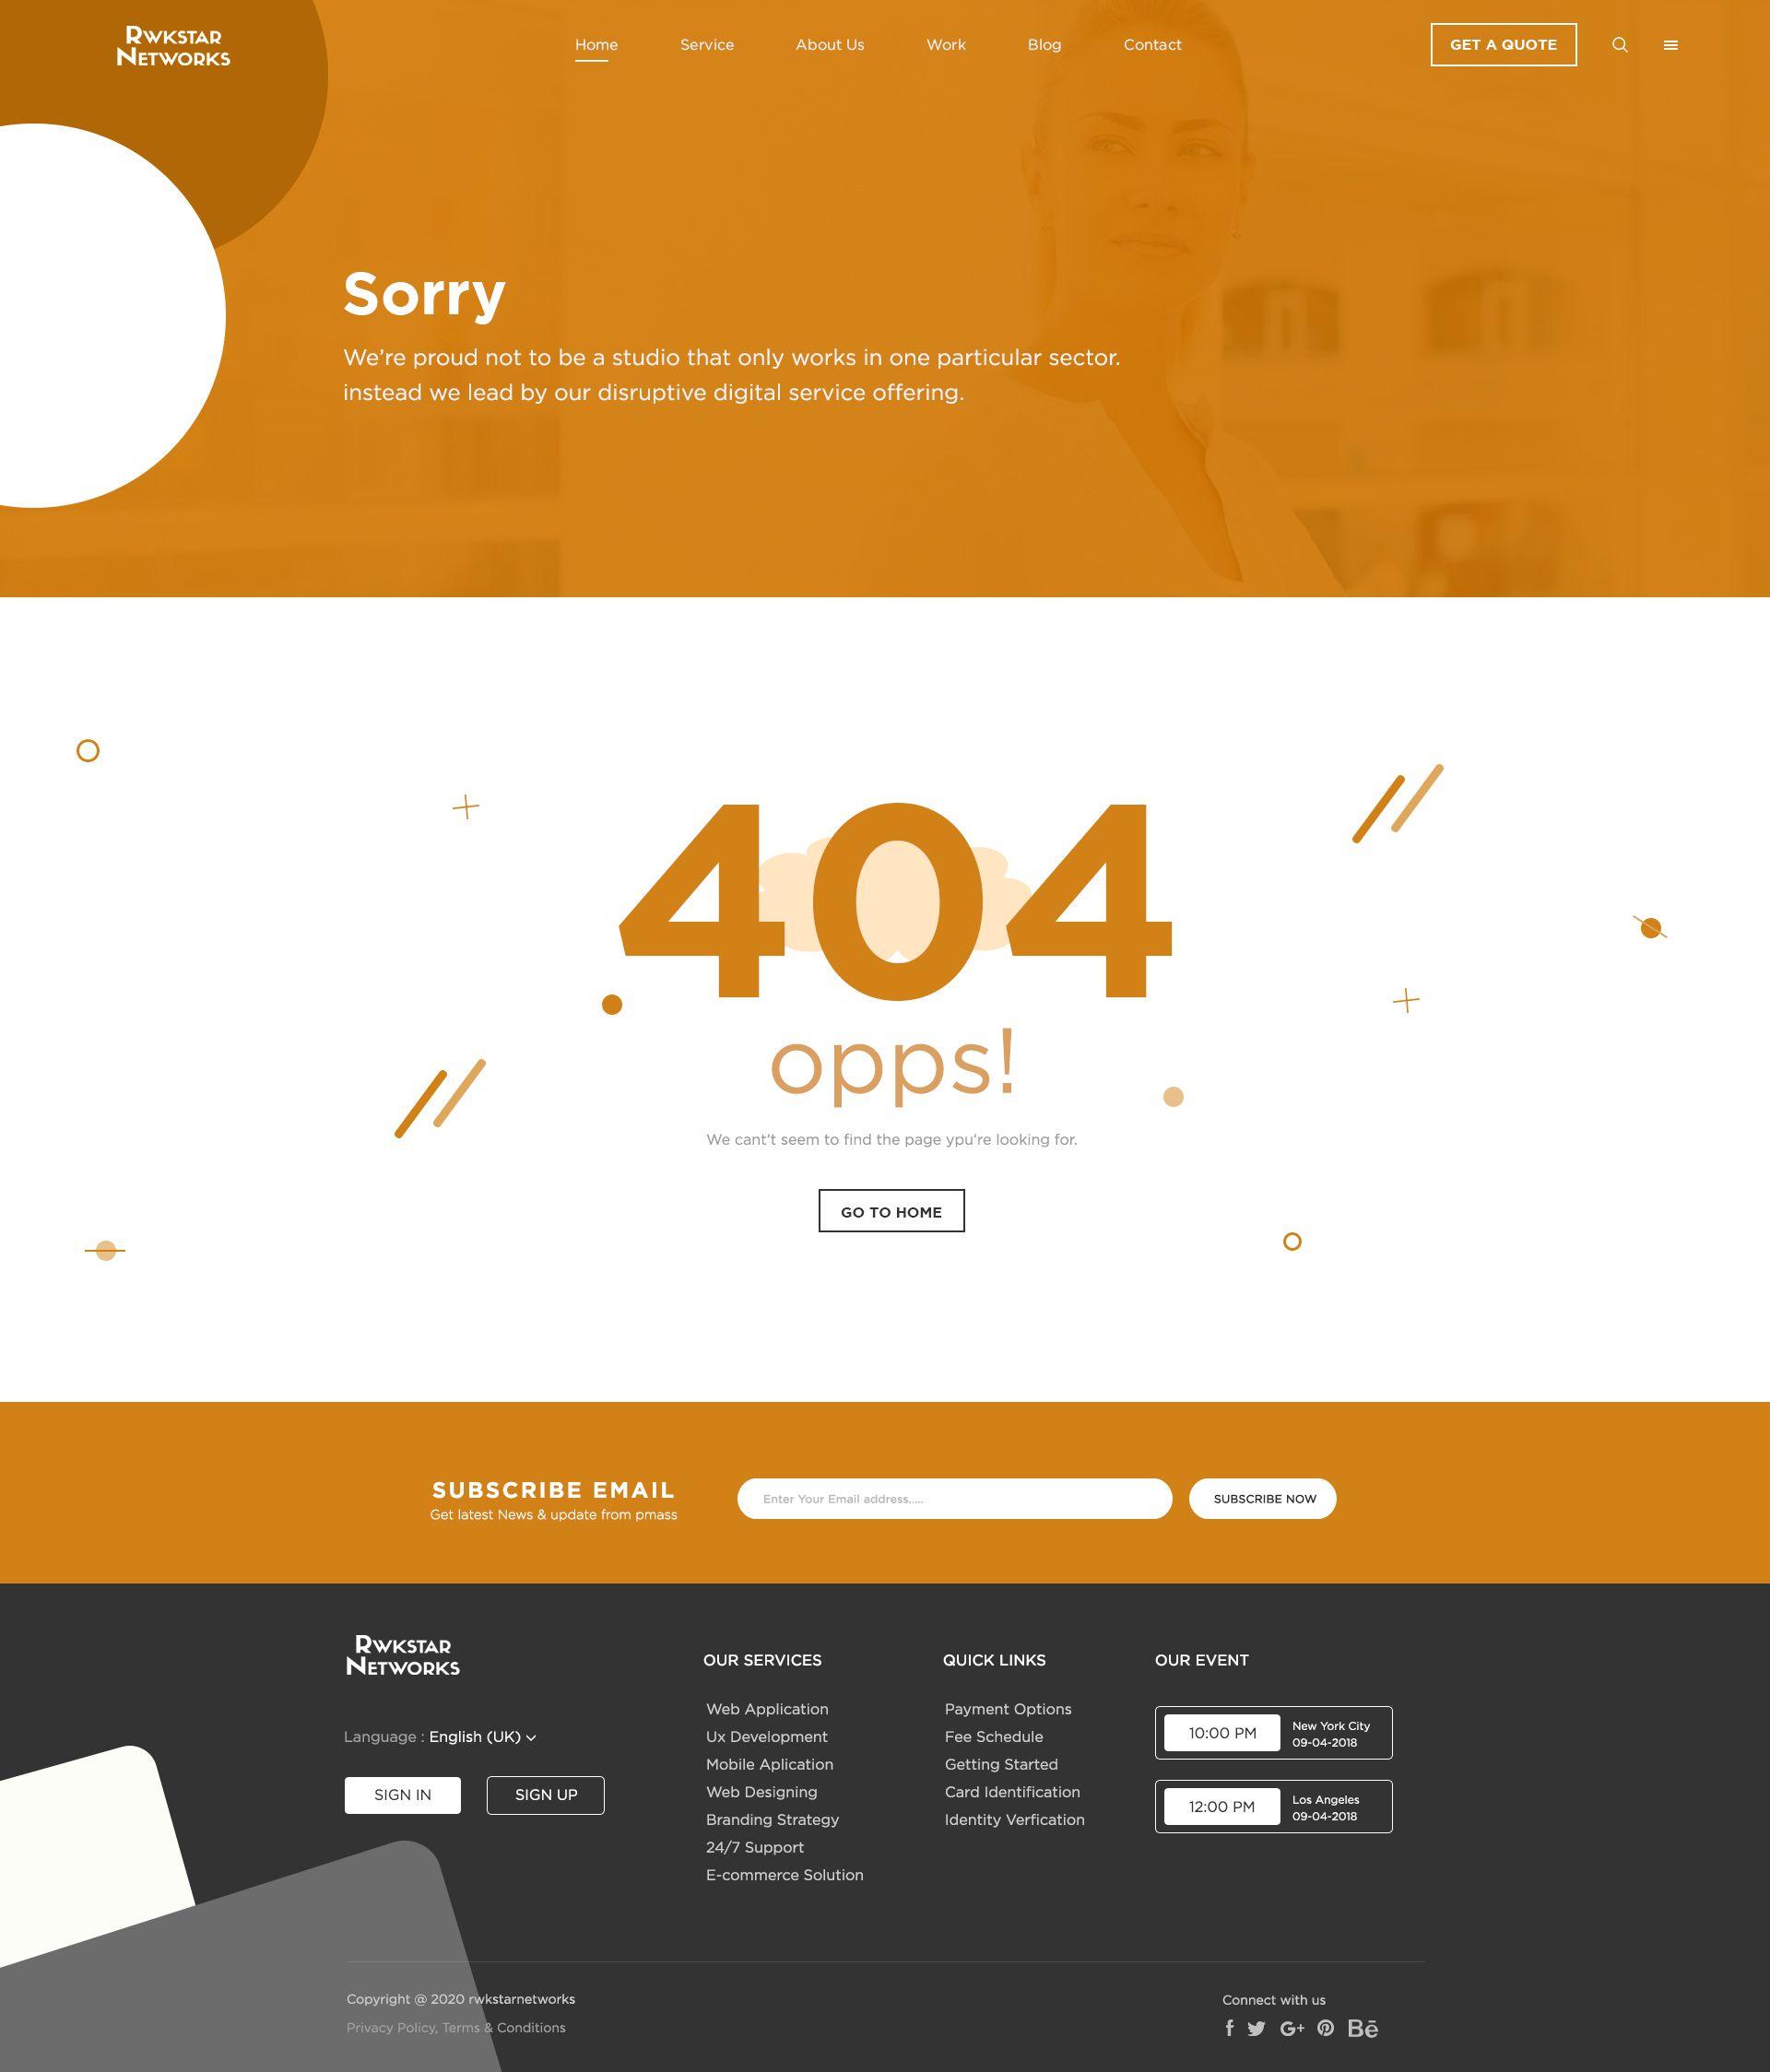 404 Error Page In 2020 Online Digital Marketing Digital Marketing Company Digital Marketing